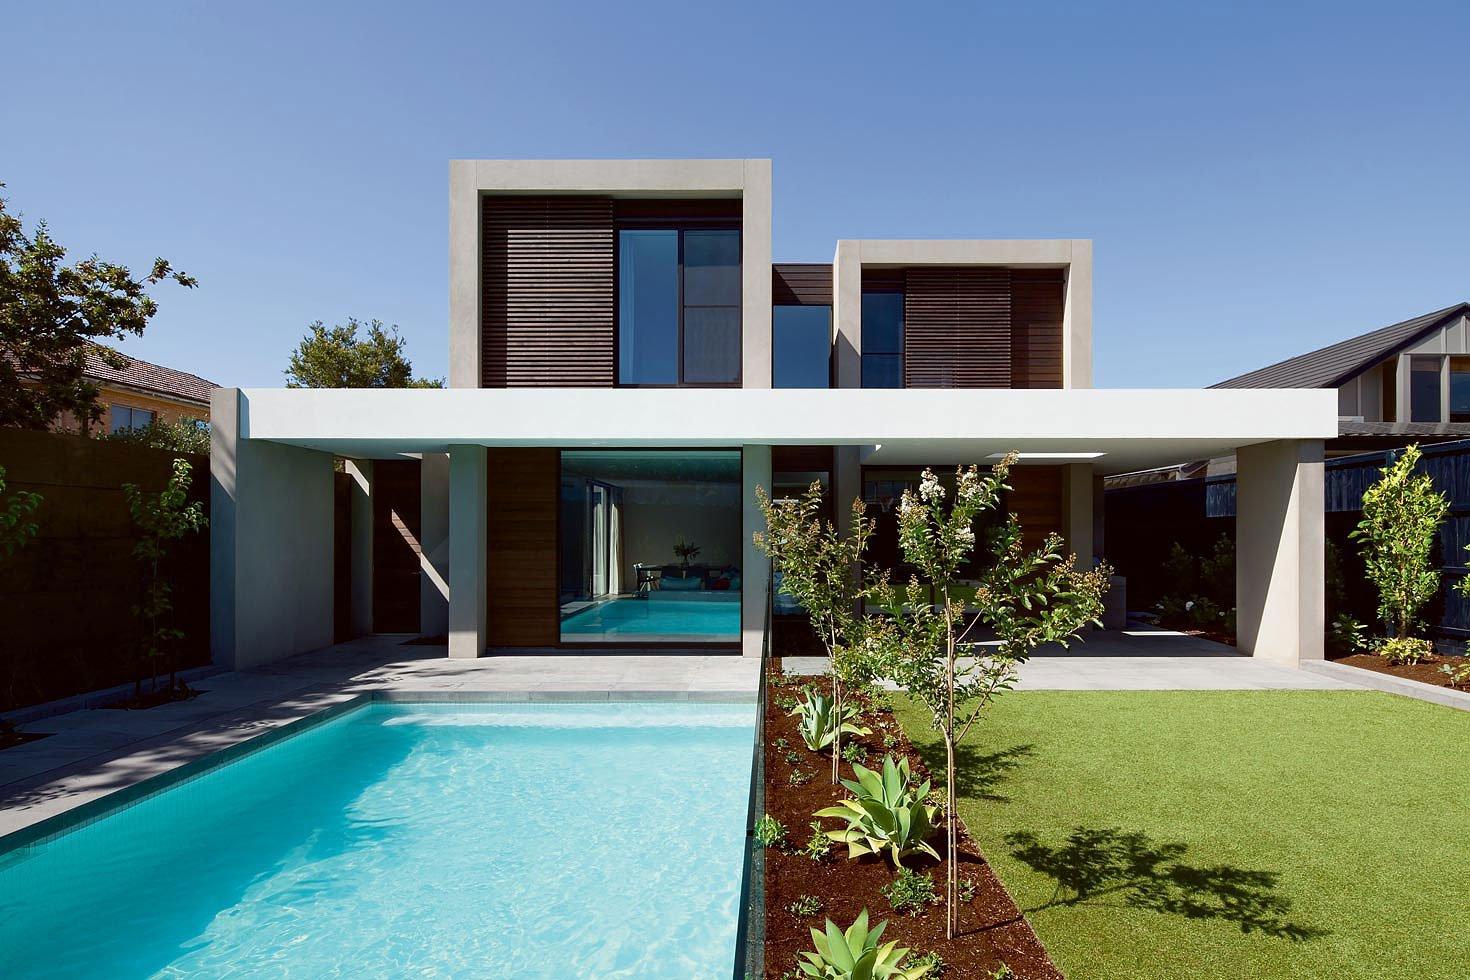 Brighton house by inform design caandesign for Brighton house